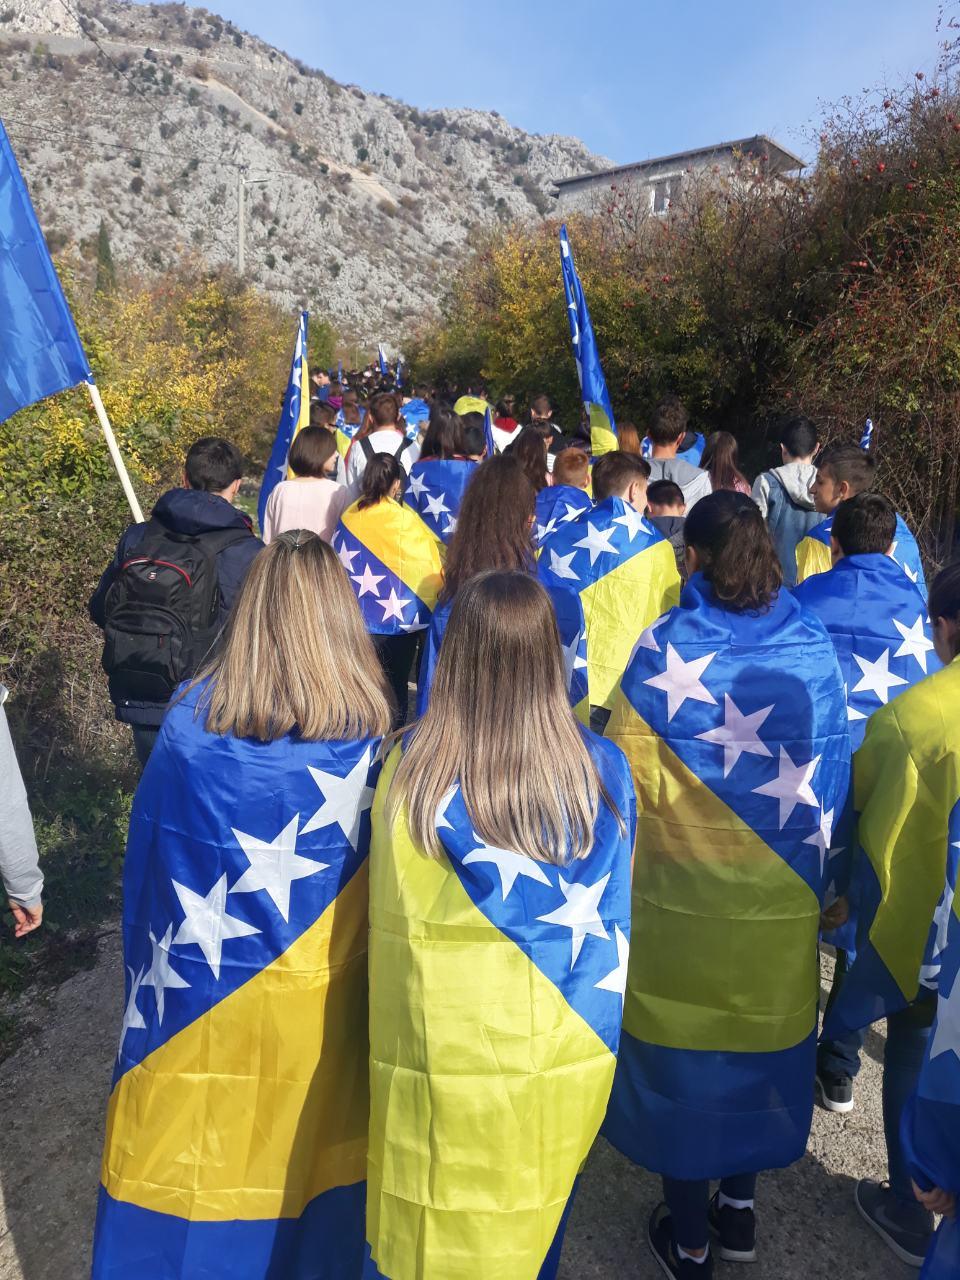 Obilježavanje Dana državnosti BiH